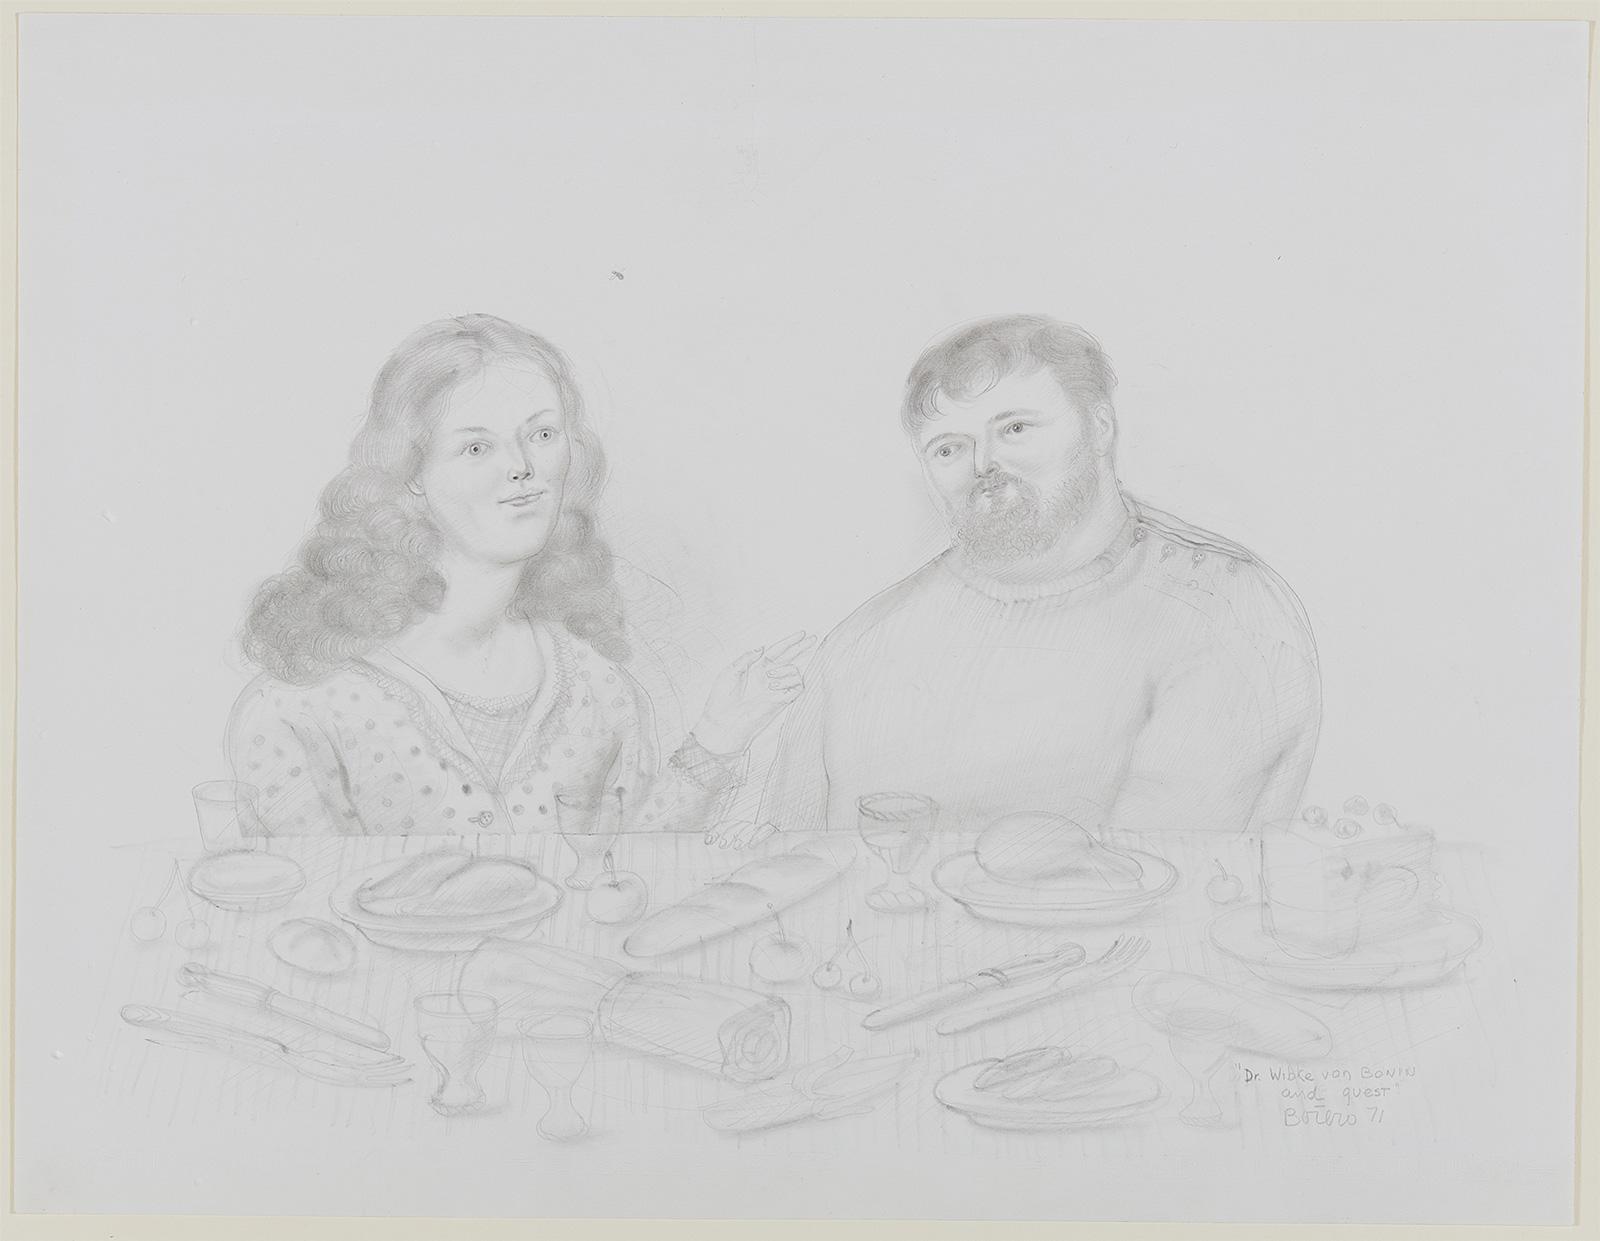 Fernando Botero: Dr. Wibke von Bonin and guest (Harald Szeemann) | ARGUS Art Asset Austria, Wien